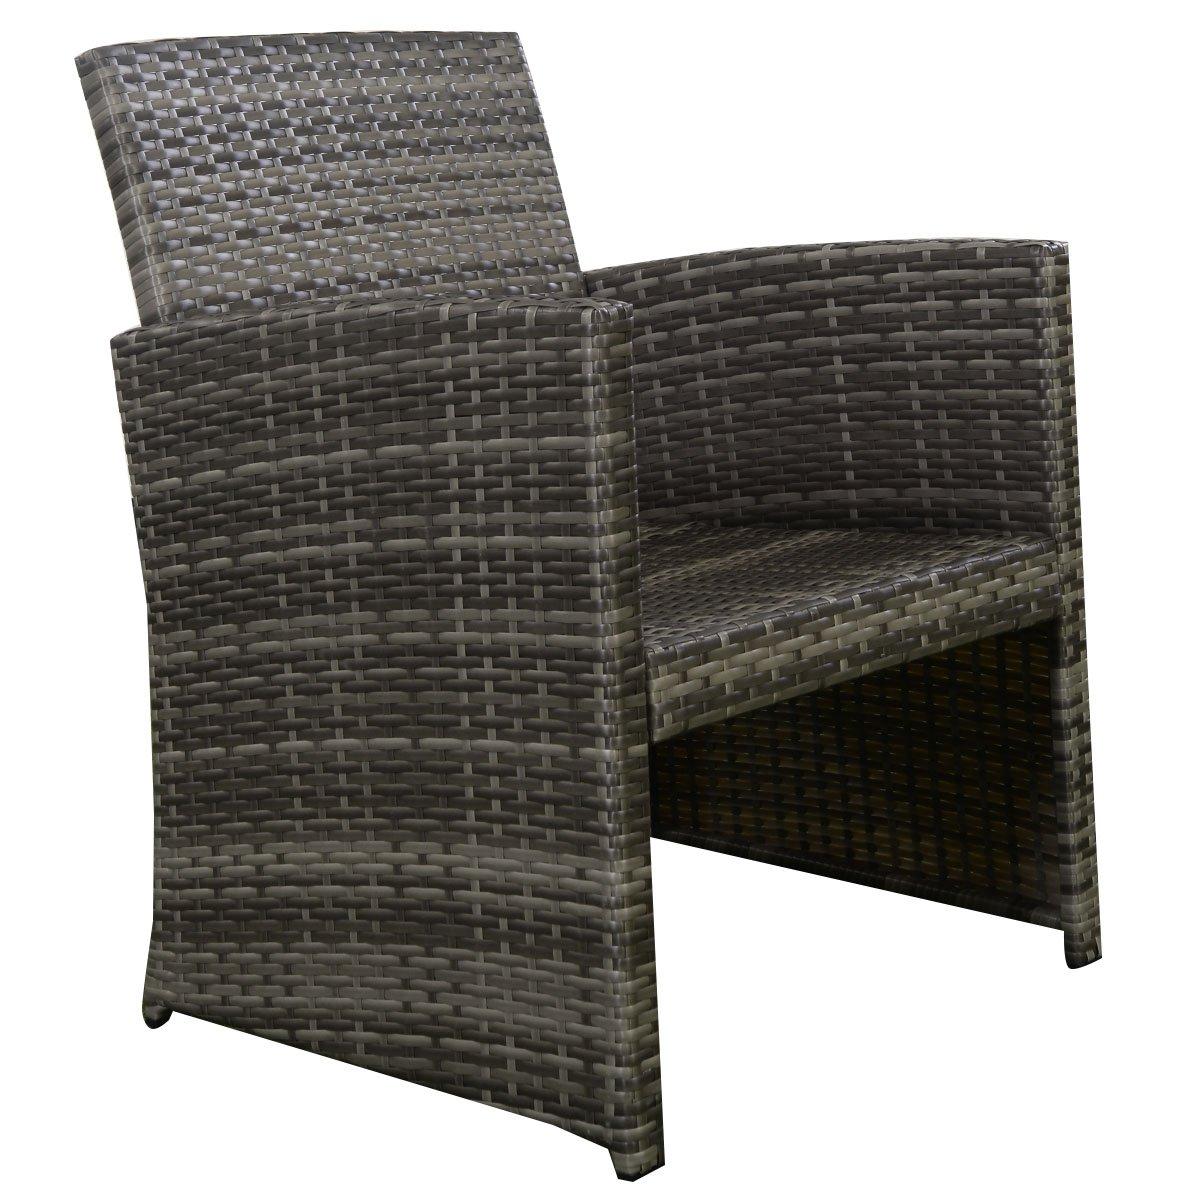 Amazon.com: Goplus 4 PC Rattan Patio Furniture Set Garden Lawn Sofa  Cushioned Seat Wicker Sofa (Mix Gray): Garden U0026 Outdoor Part 26